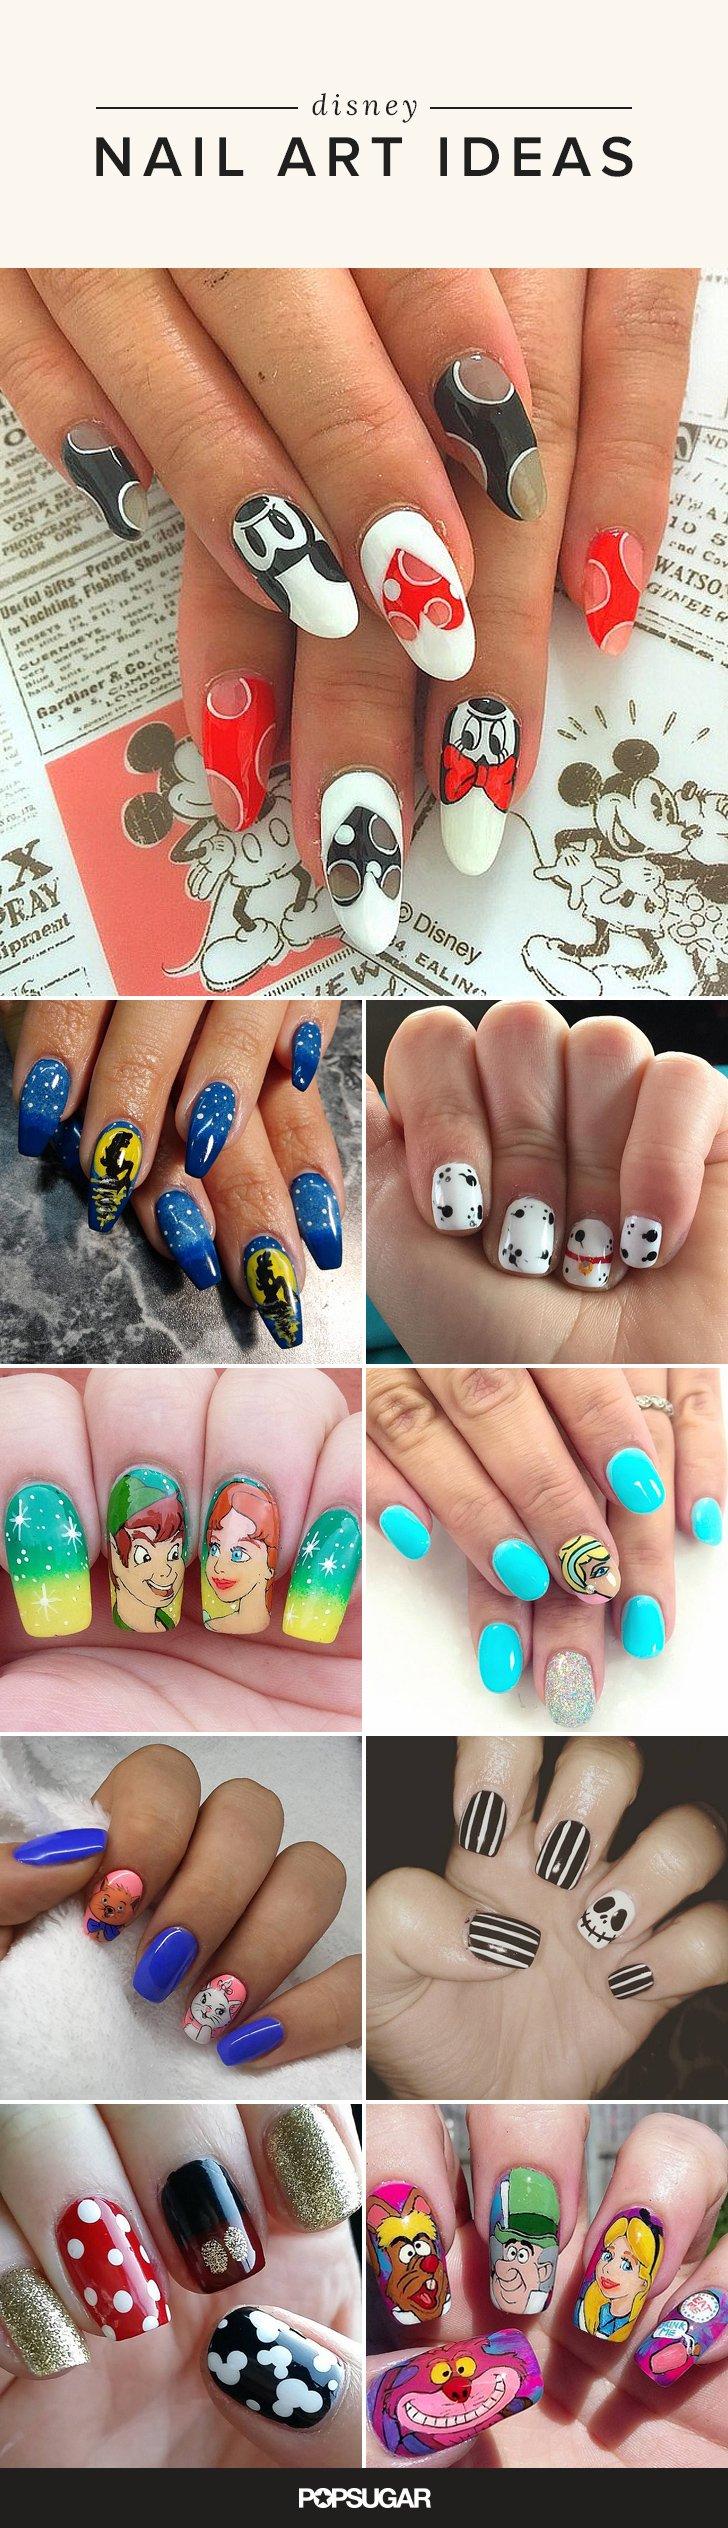 Nails Ideas for Disneyland! | Disney nails, Youtube nail art and ...